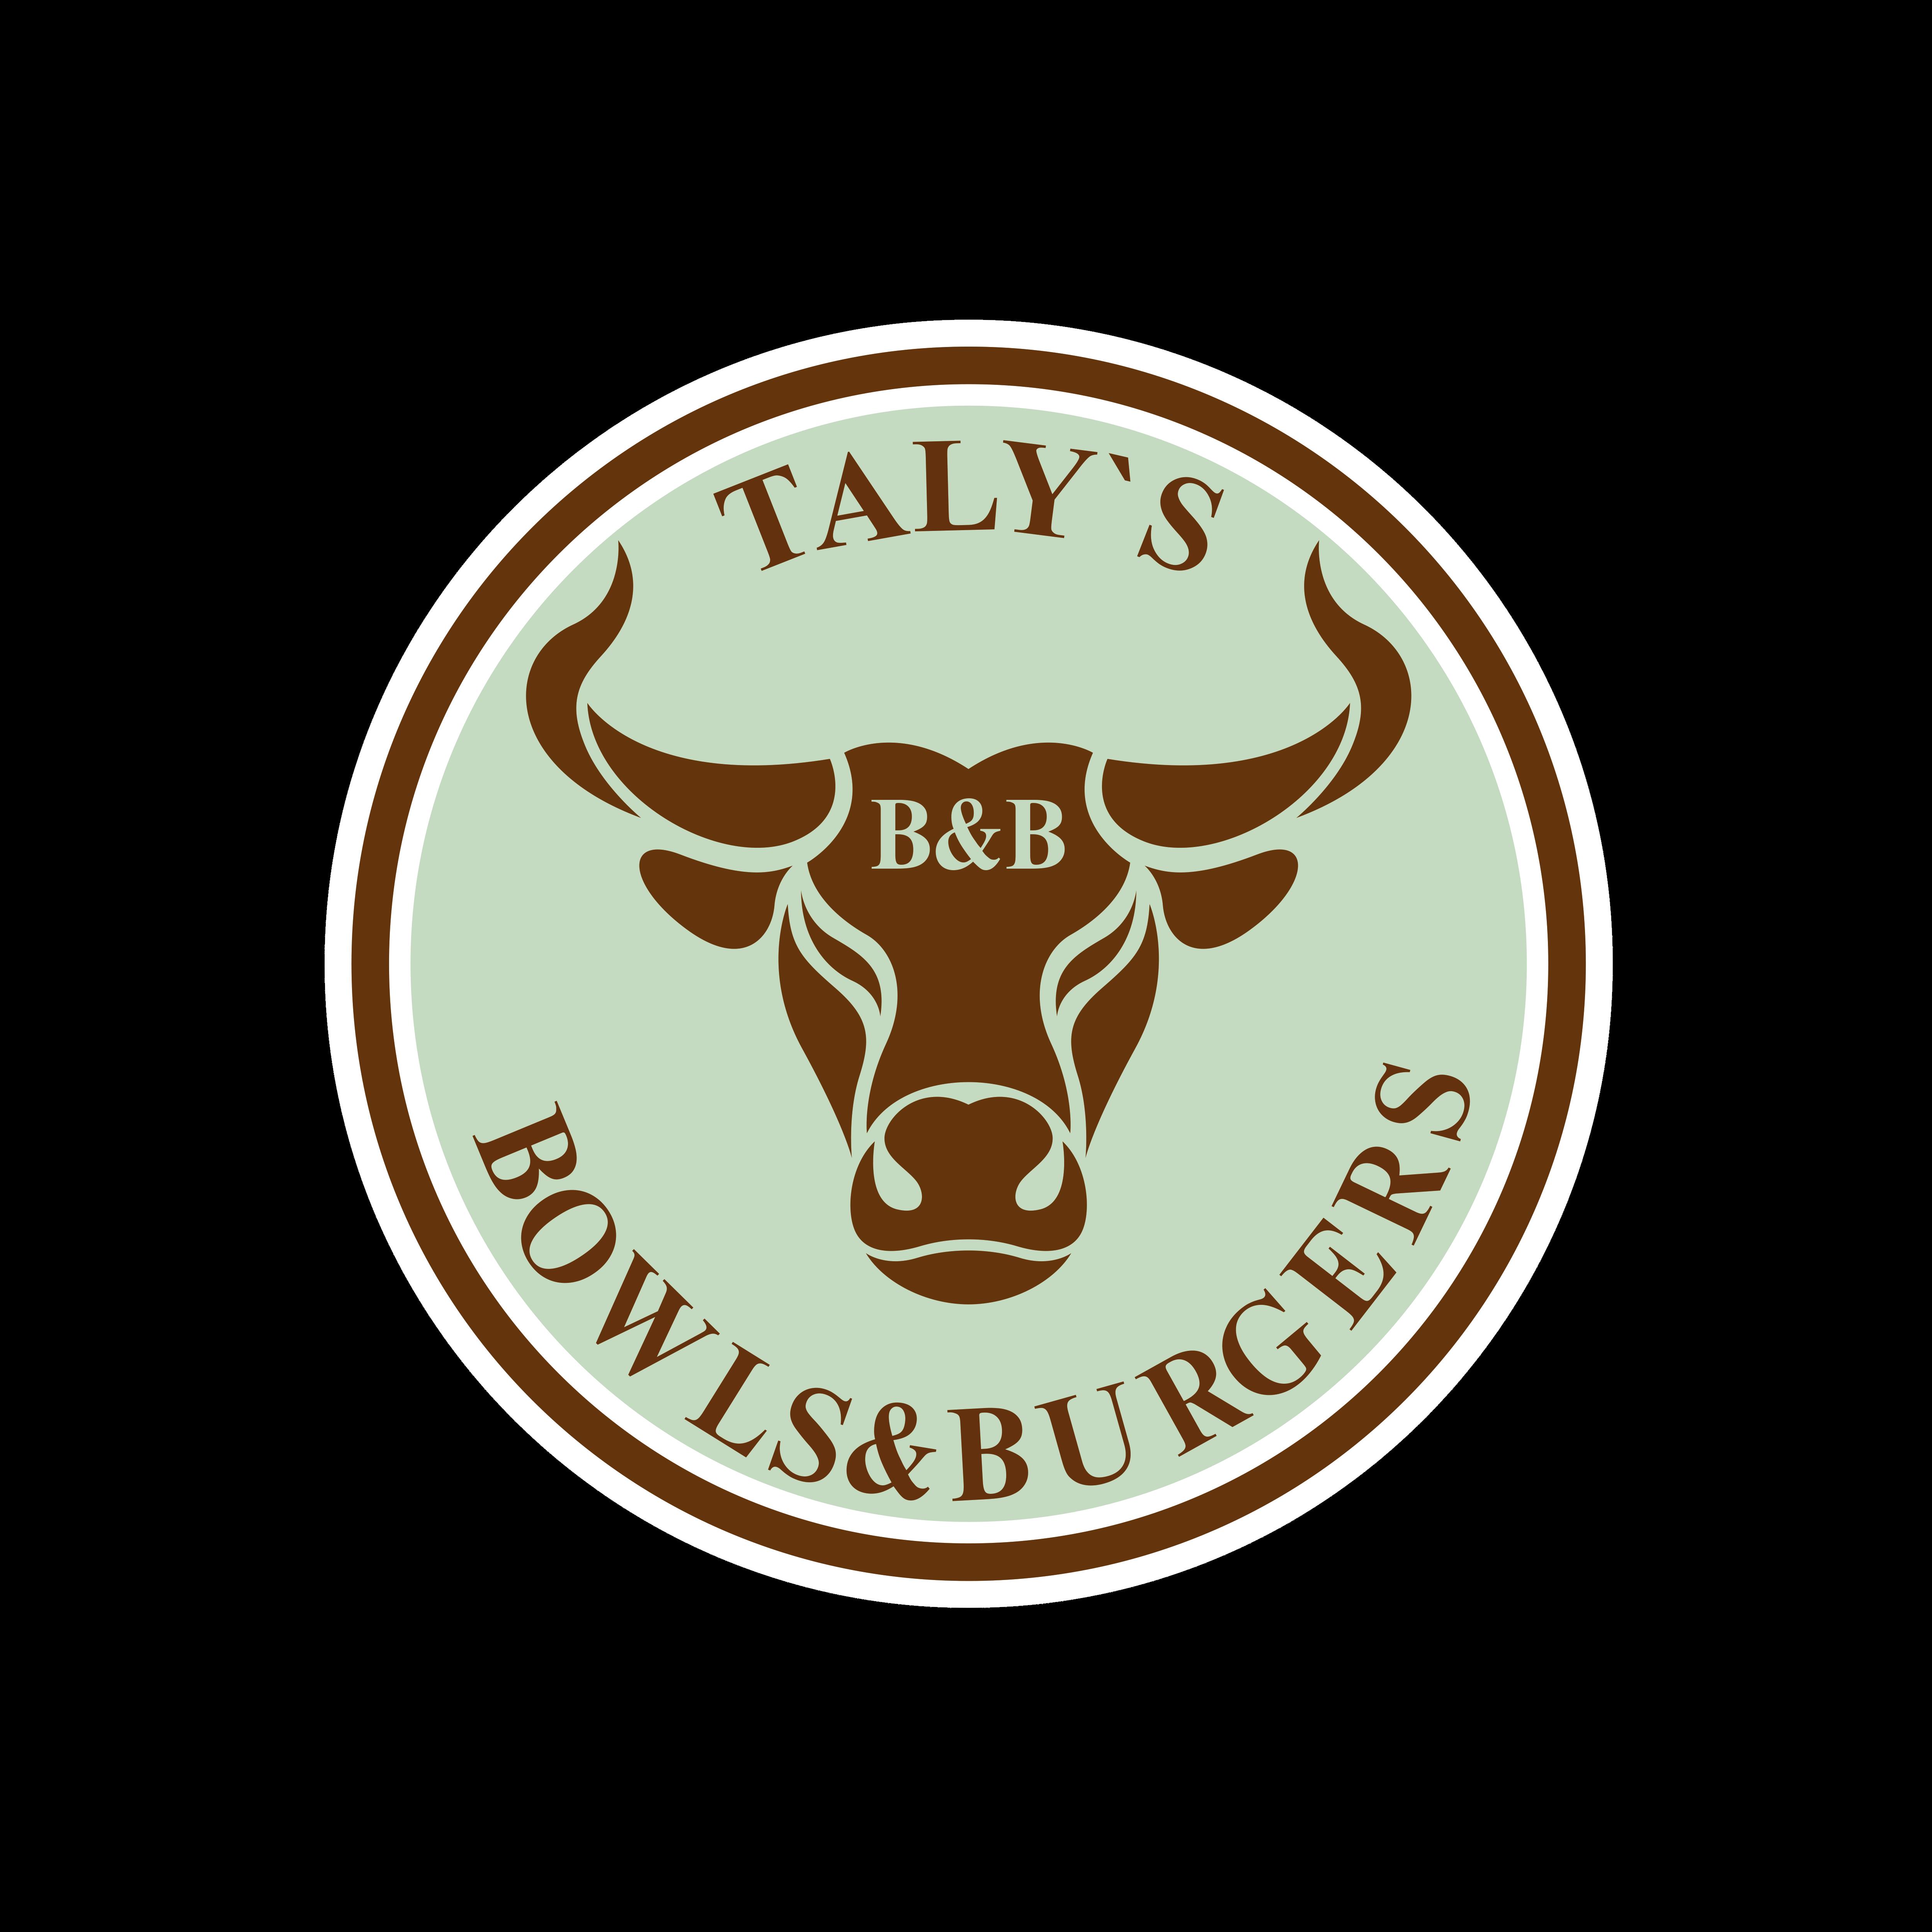 talys bowls